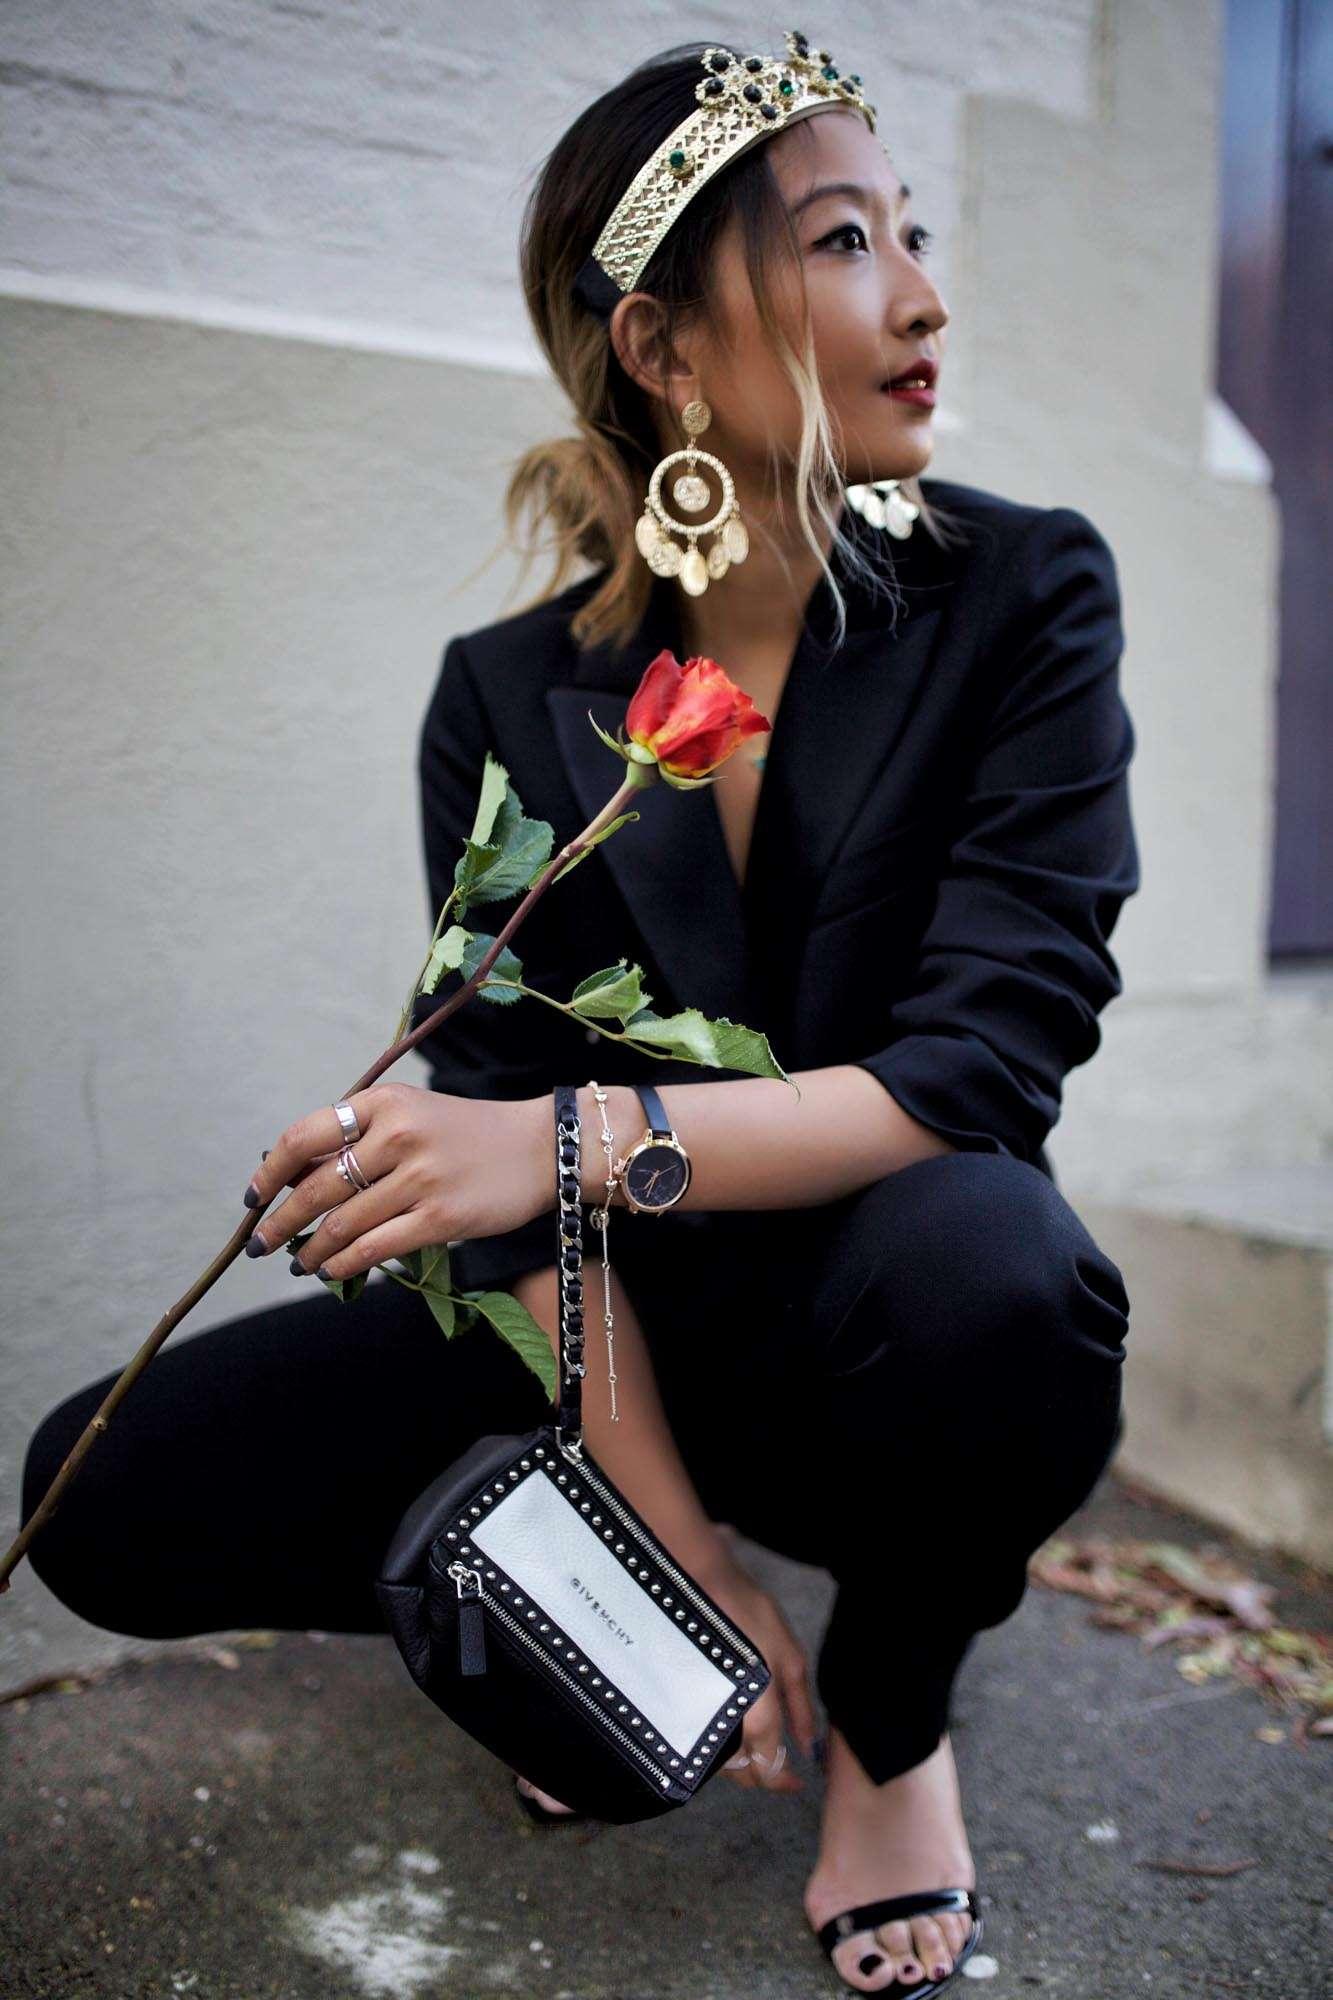 Sonia Rykiel Pantsuit, Givenchy, Derby Day, Lovisa, Spring Carnival